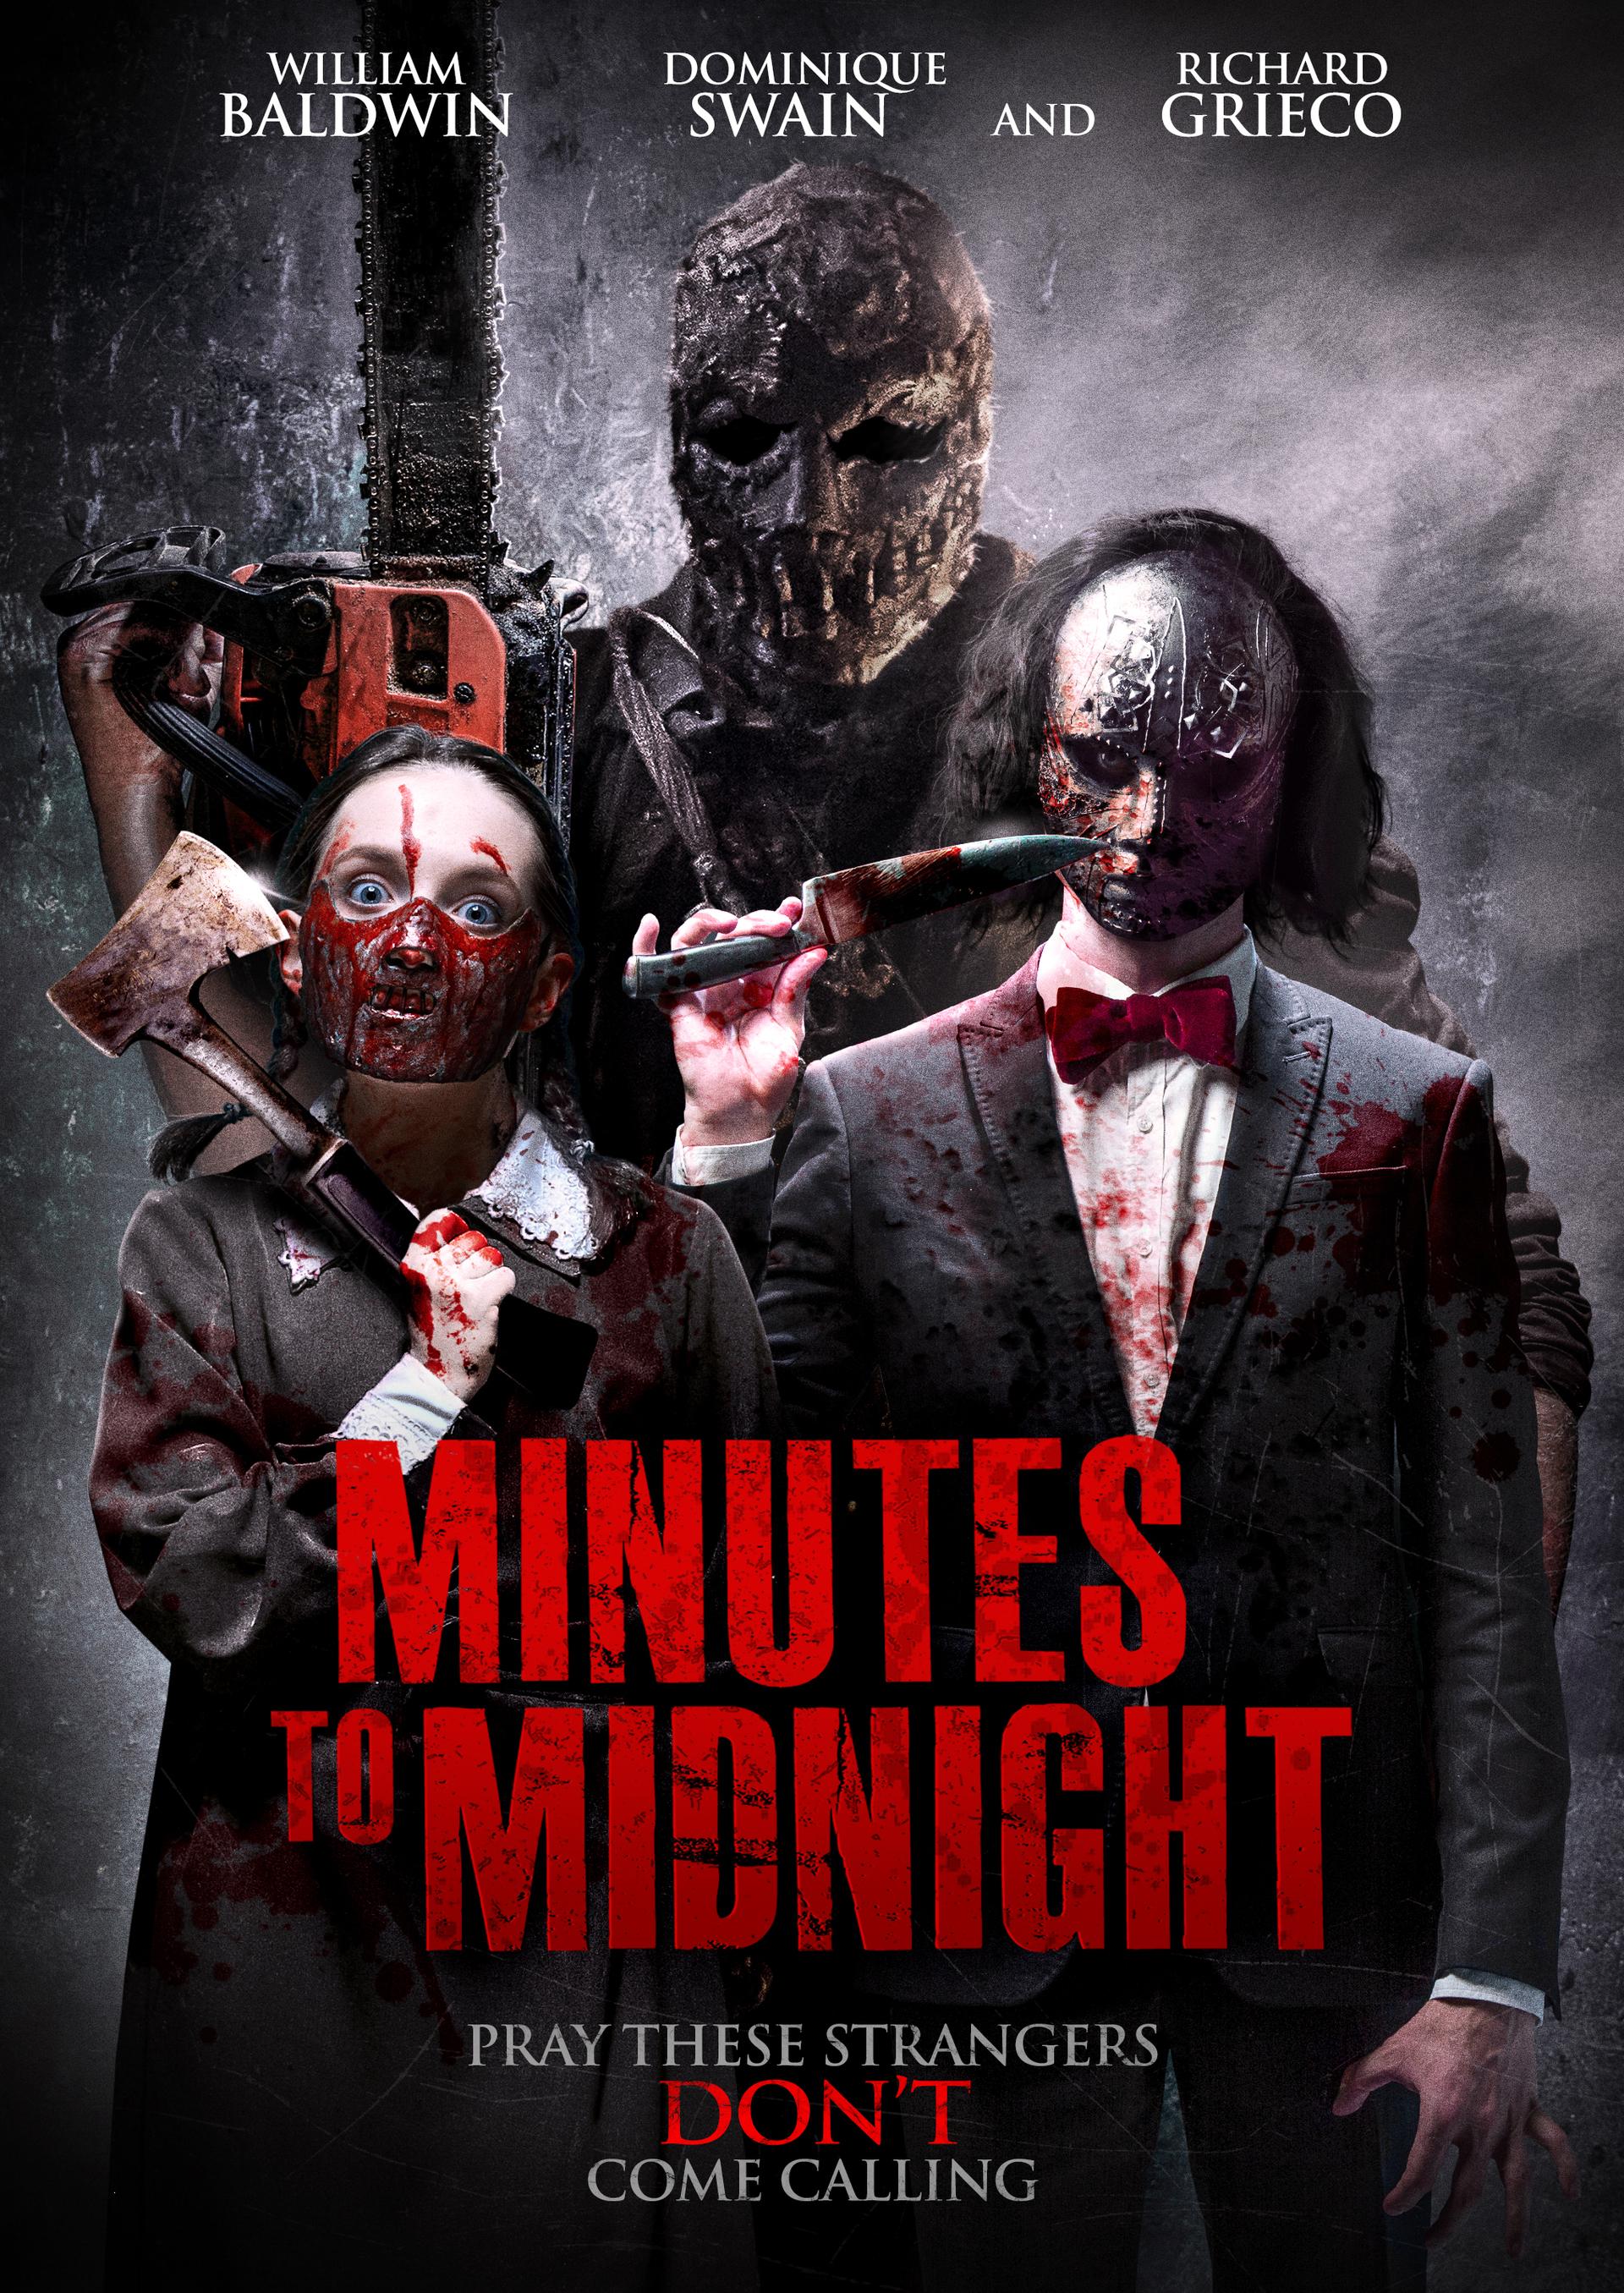 MINUTES_TO_MIDNIGHT-DVD_ART.jpg?1565018702